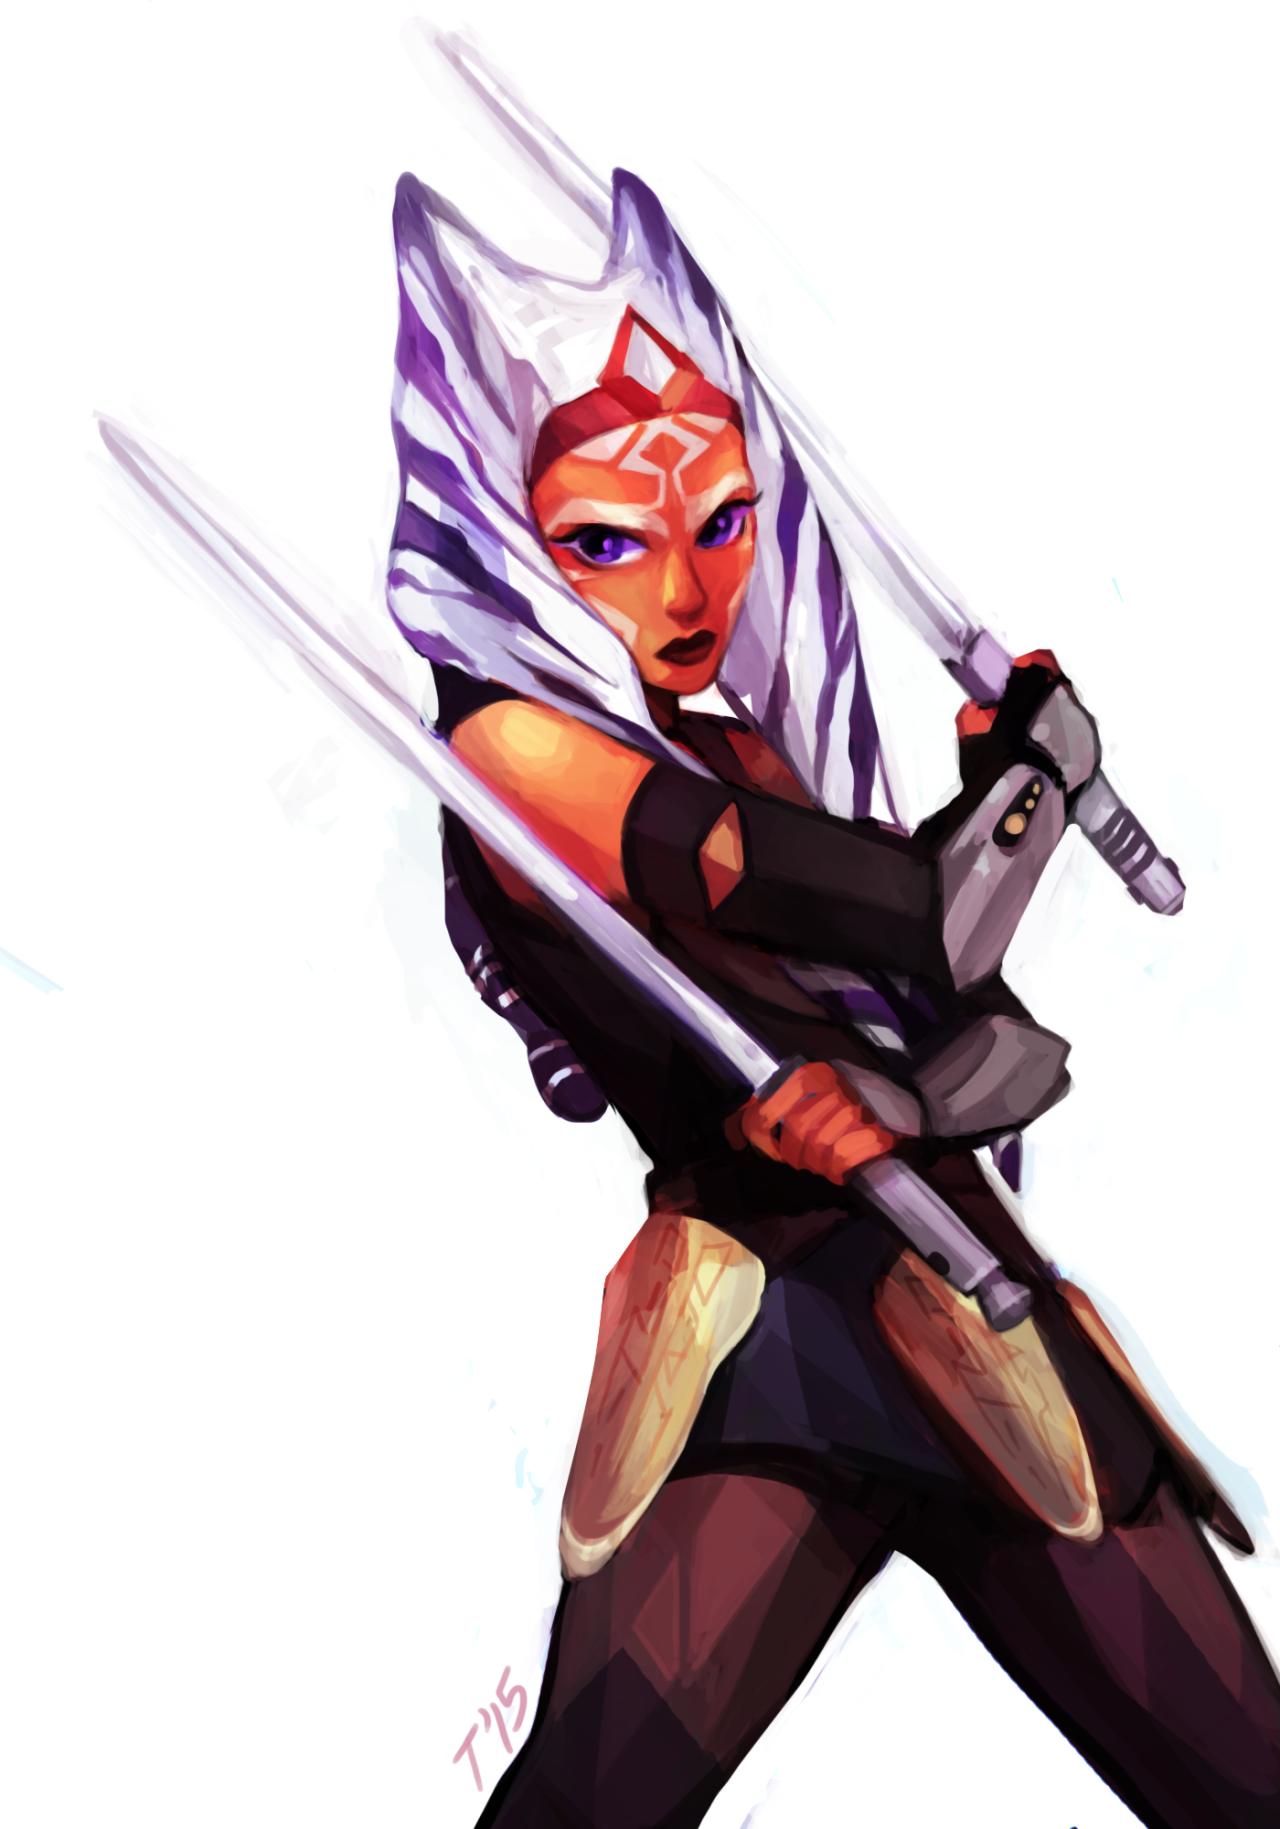 Pin By Padawan Shay On Star Wars Star Wars Ahsoka Star Wars Artwork Star Wars Characters